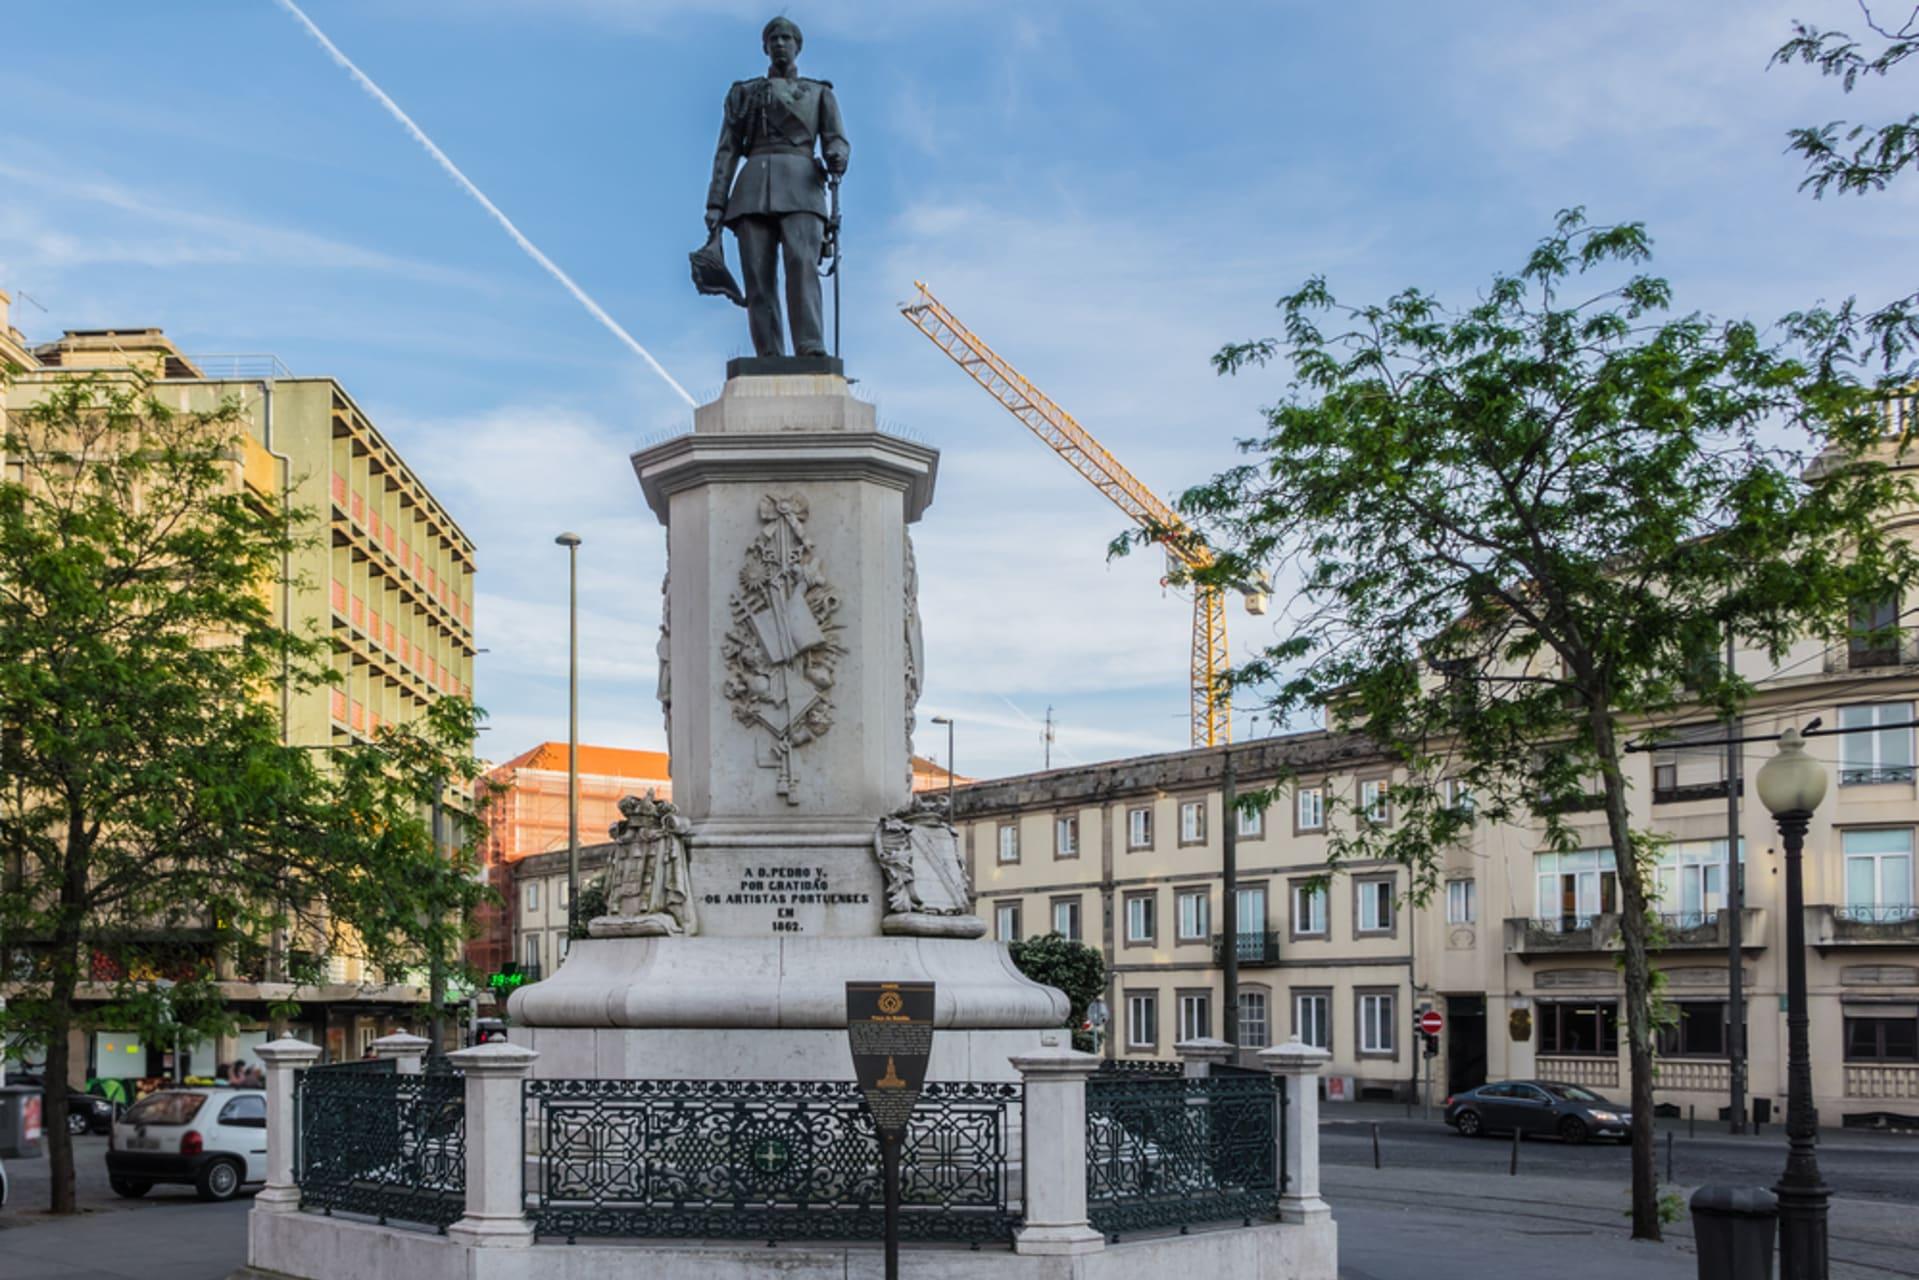 Porto - The Roaring Twenties in Porto